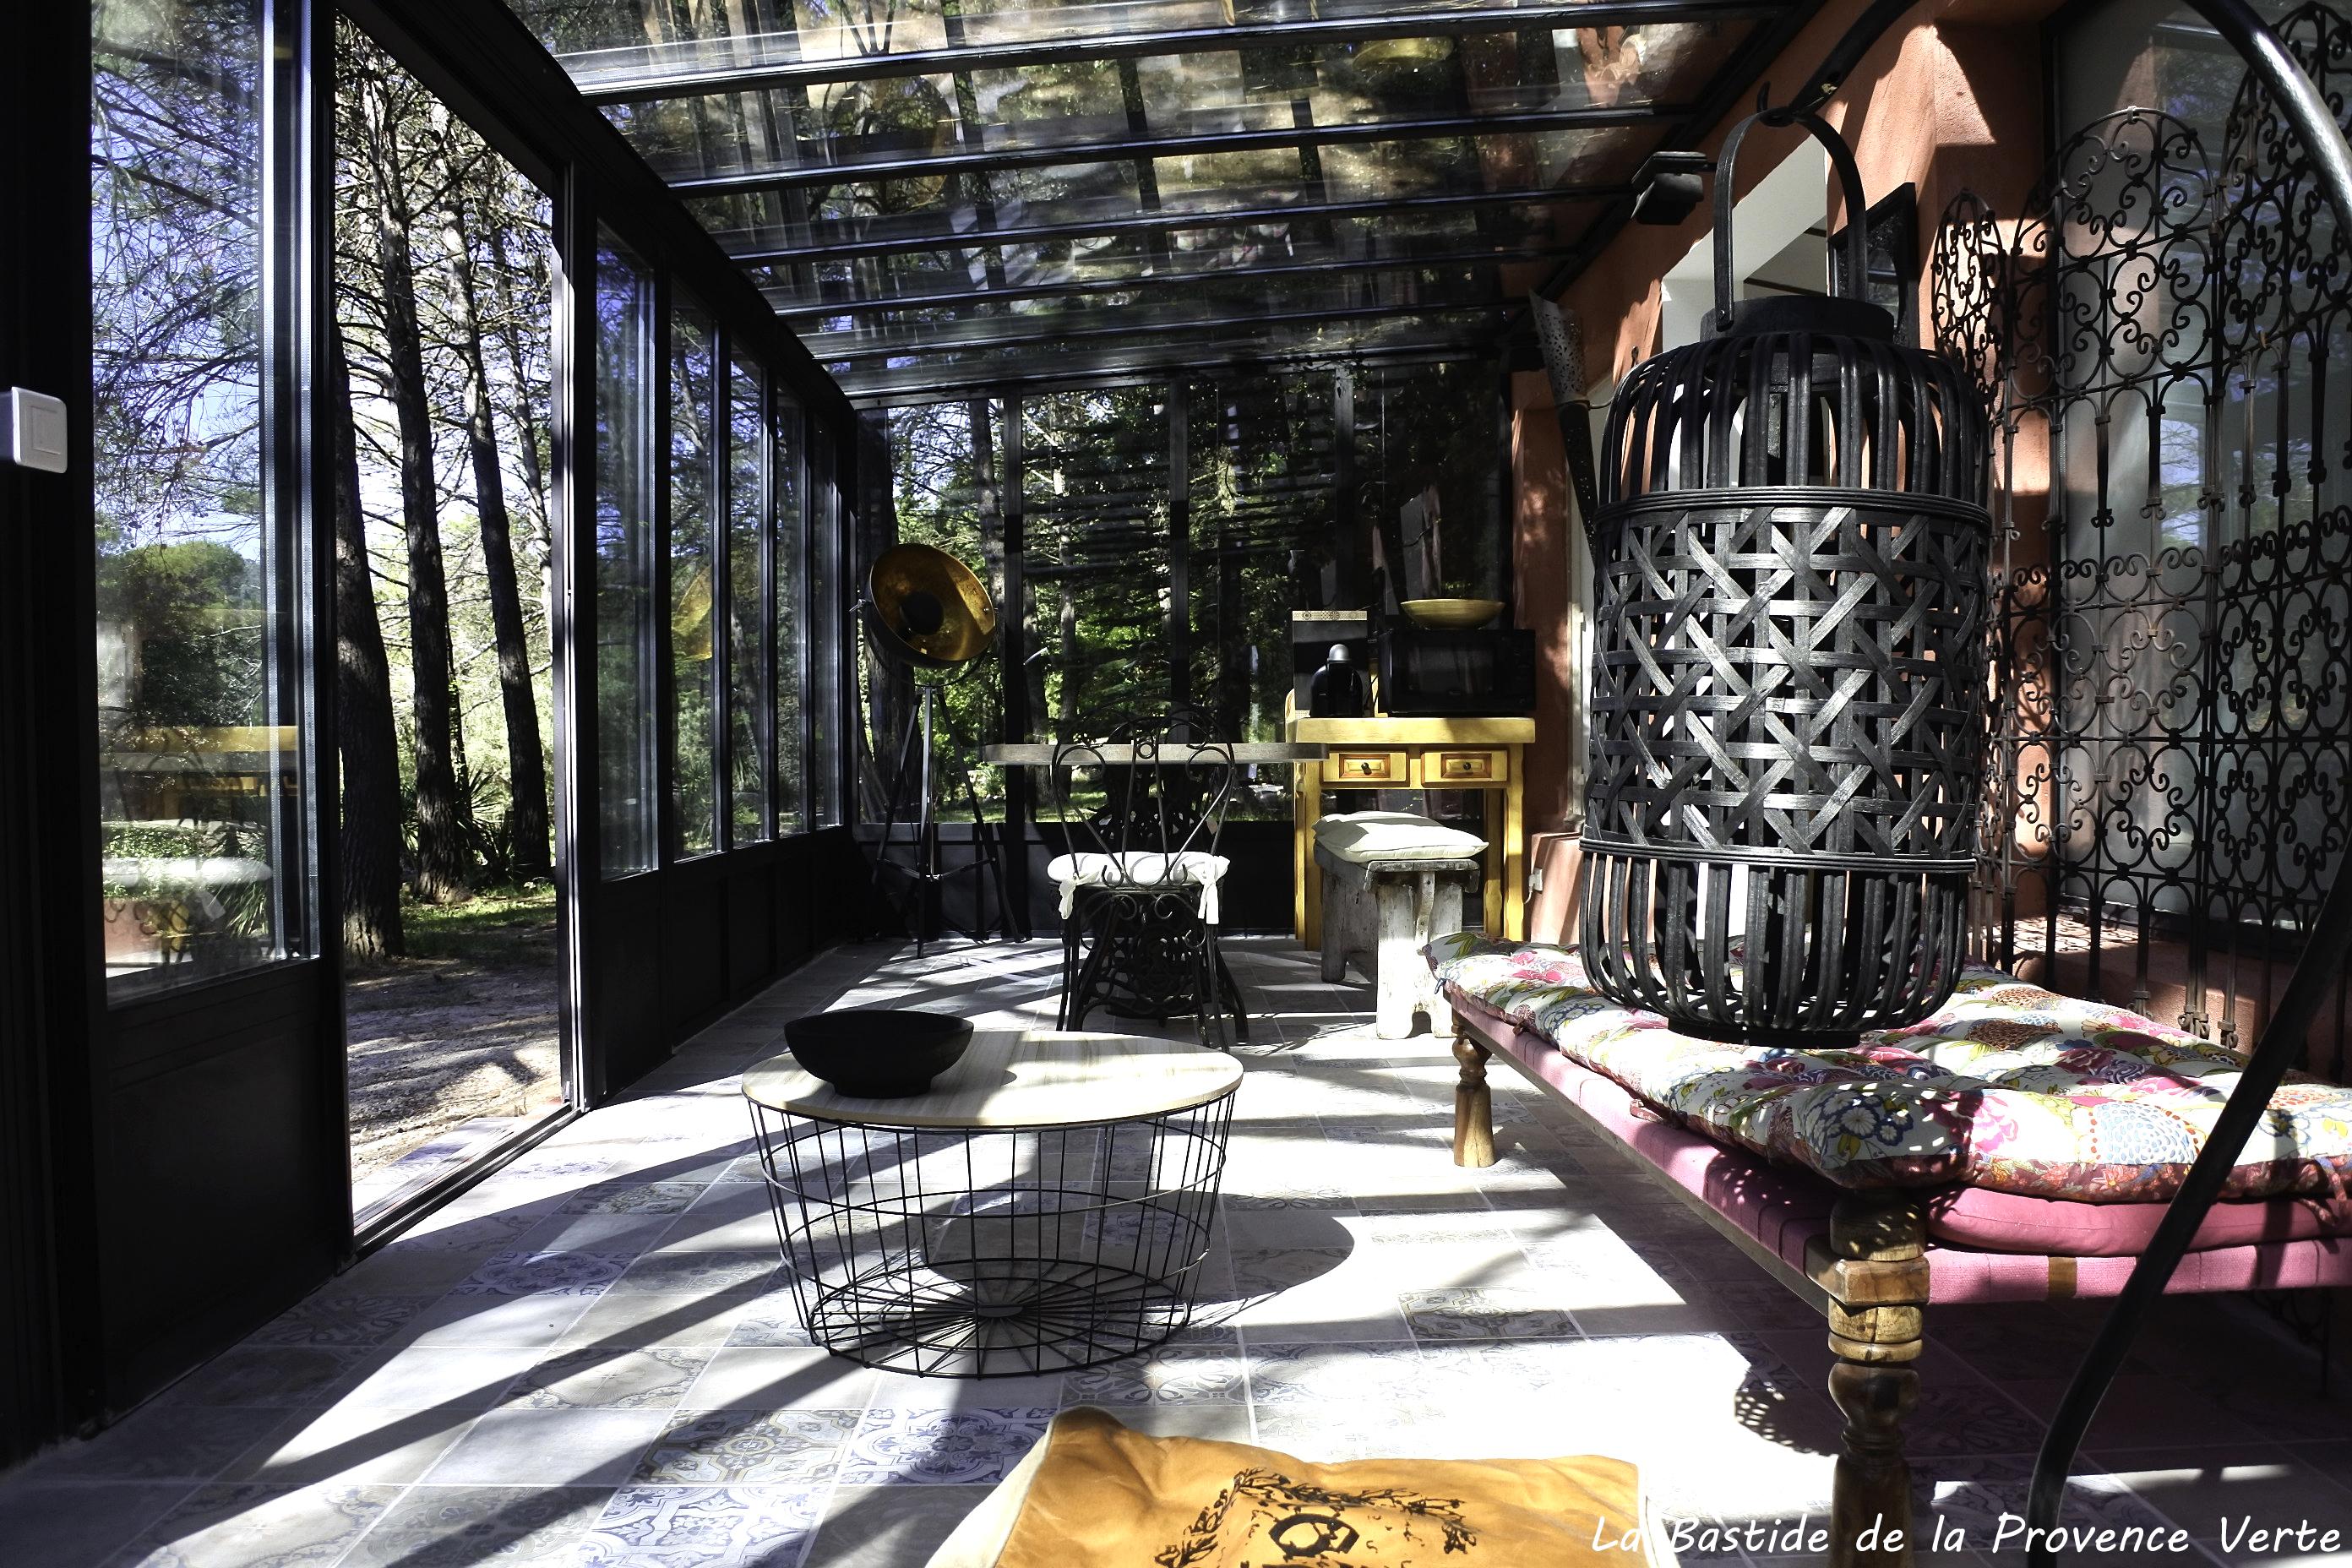 Chambre D Hotes De Charme En Provence La Bastide De La Provence Verte